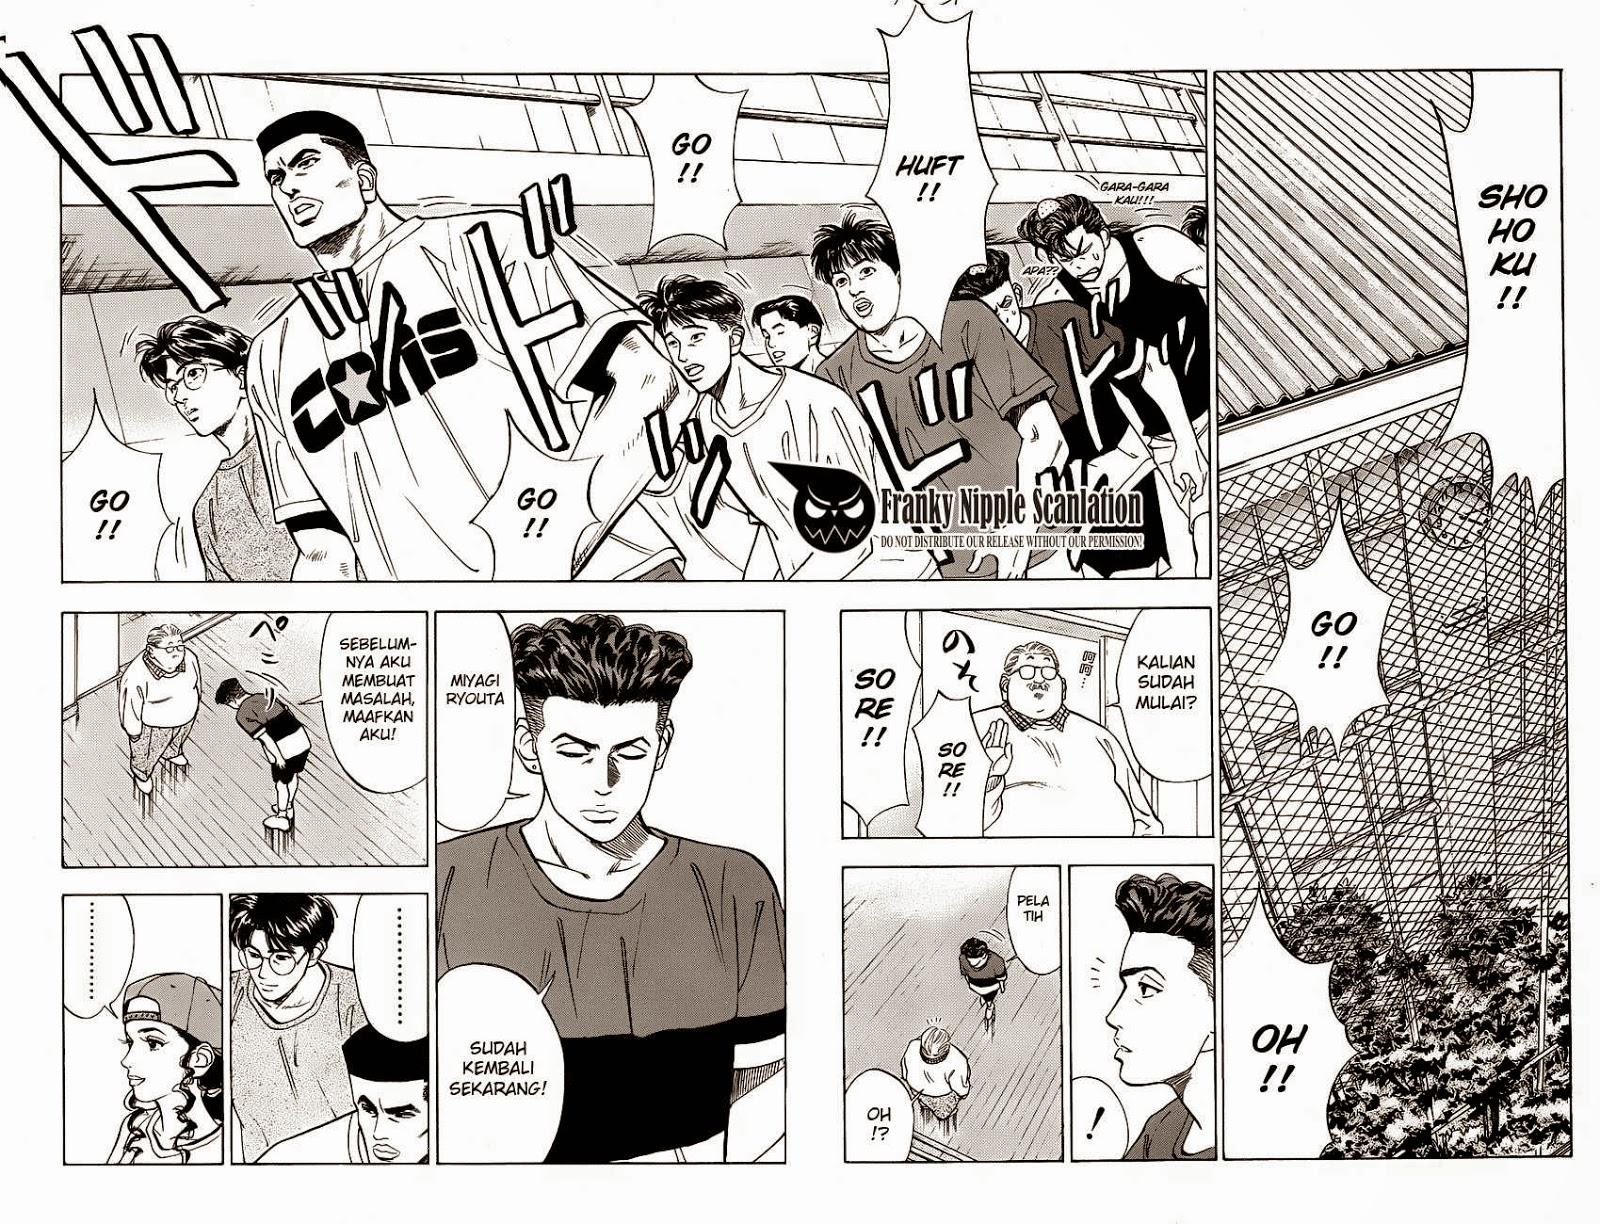 Komik slam dunk 054 - chapter 54 55 Indonesia slam dunk 054 - chapter 54 Terbaru 8|Baca Manga Komik Indonesia|